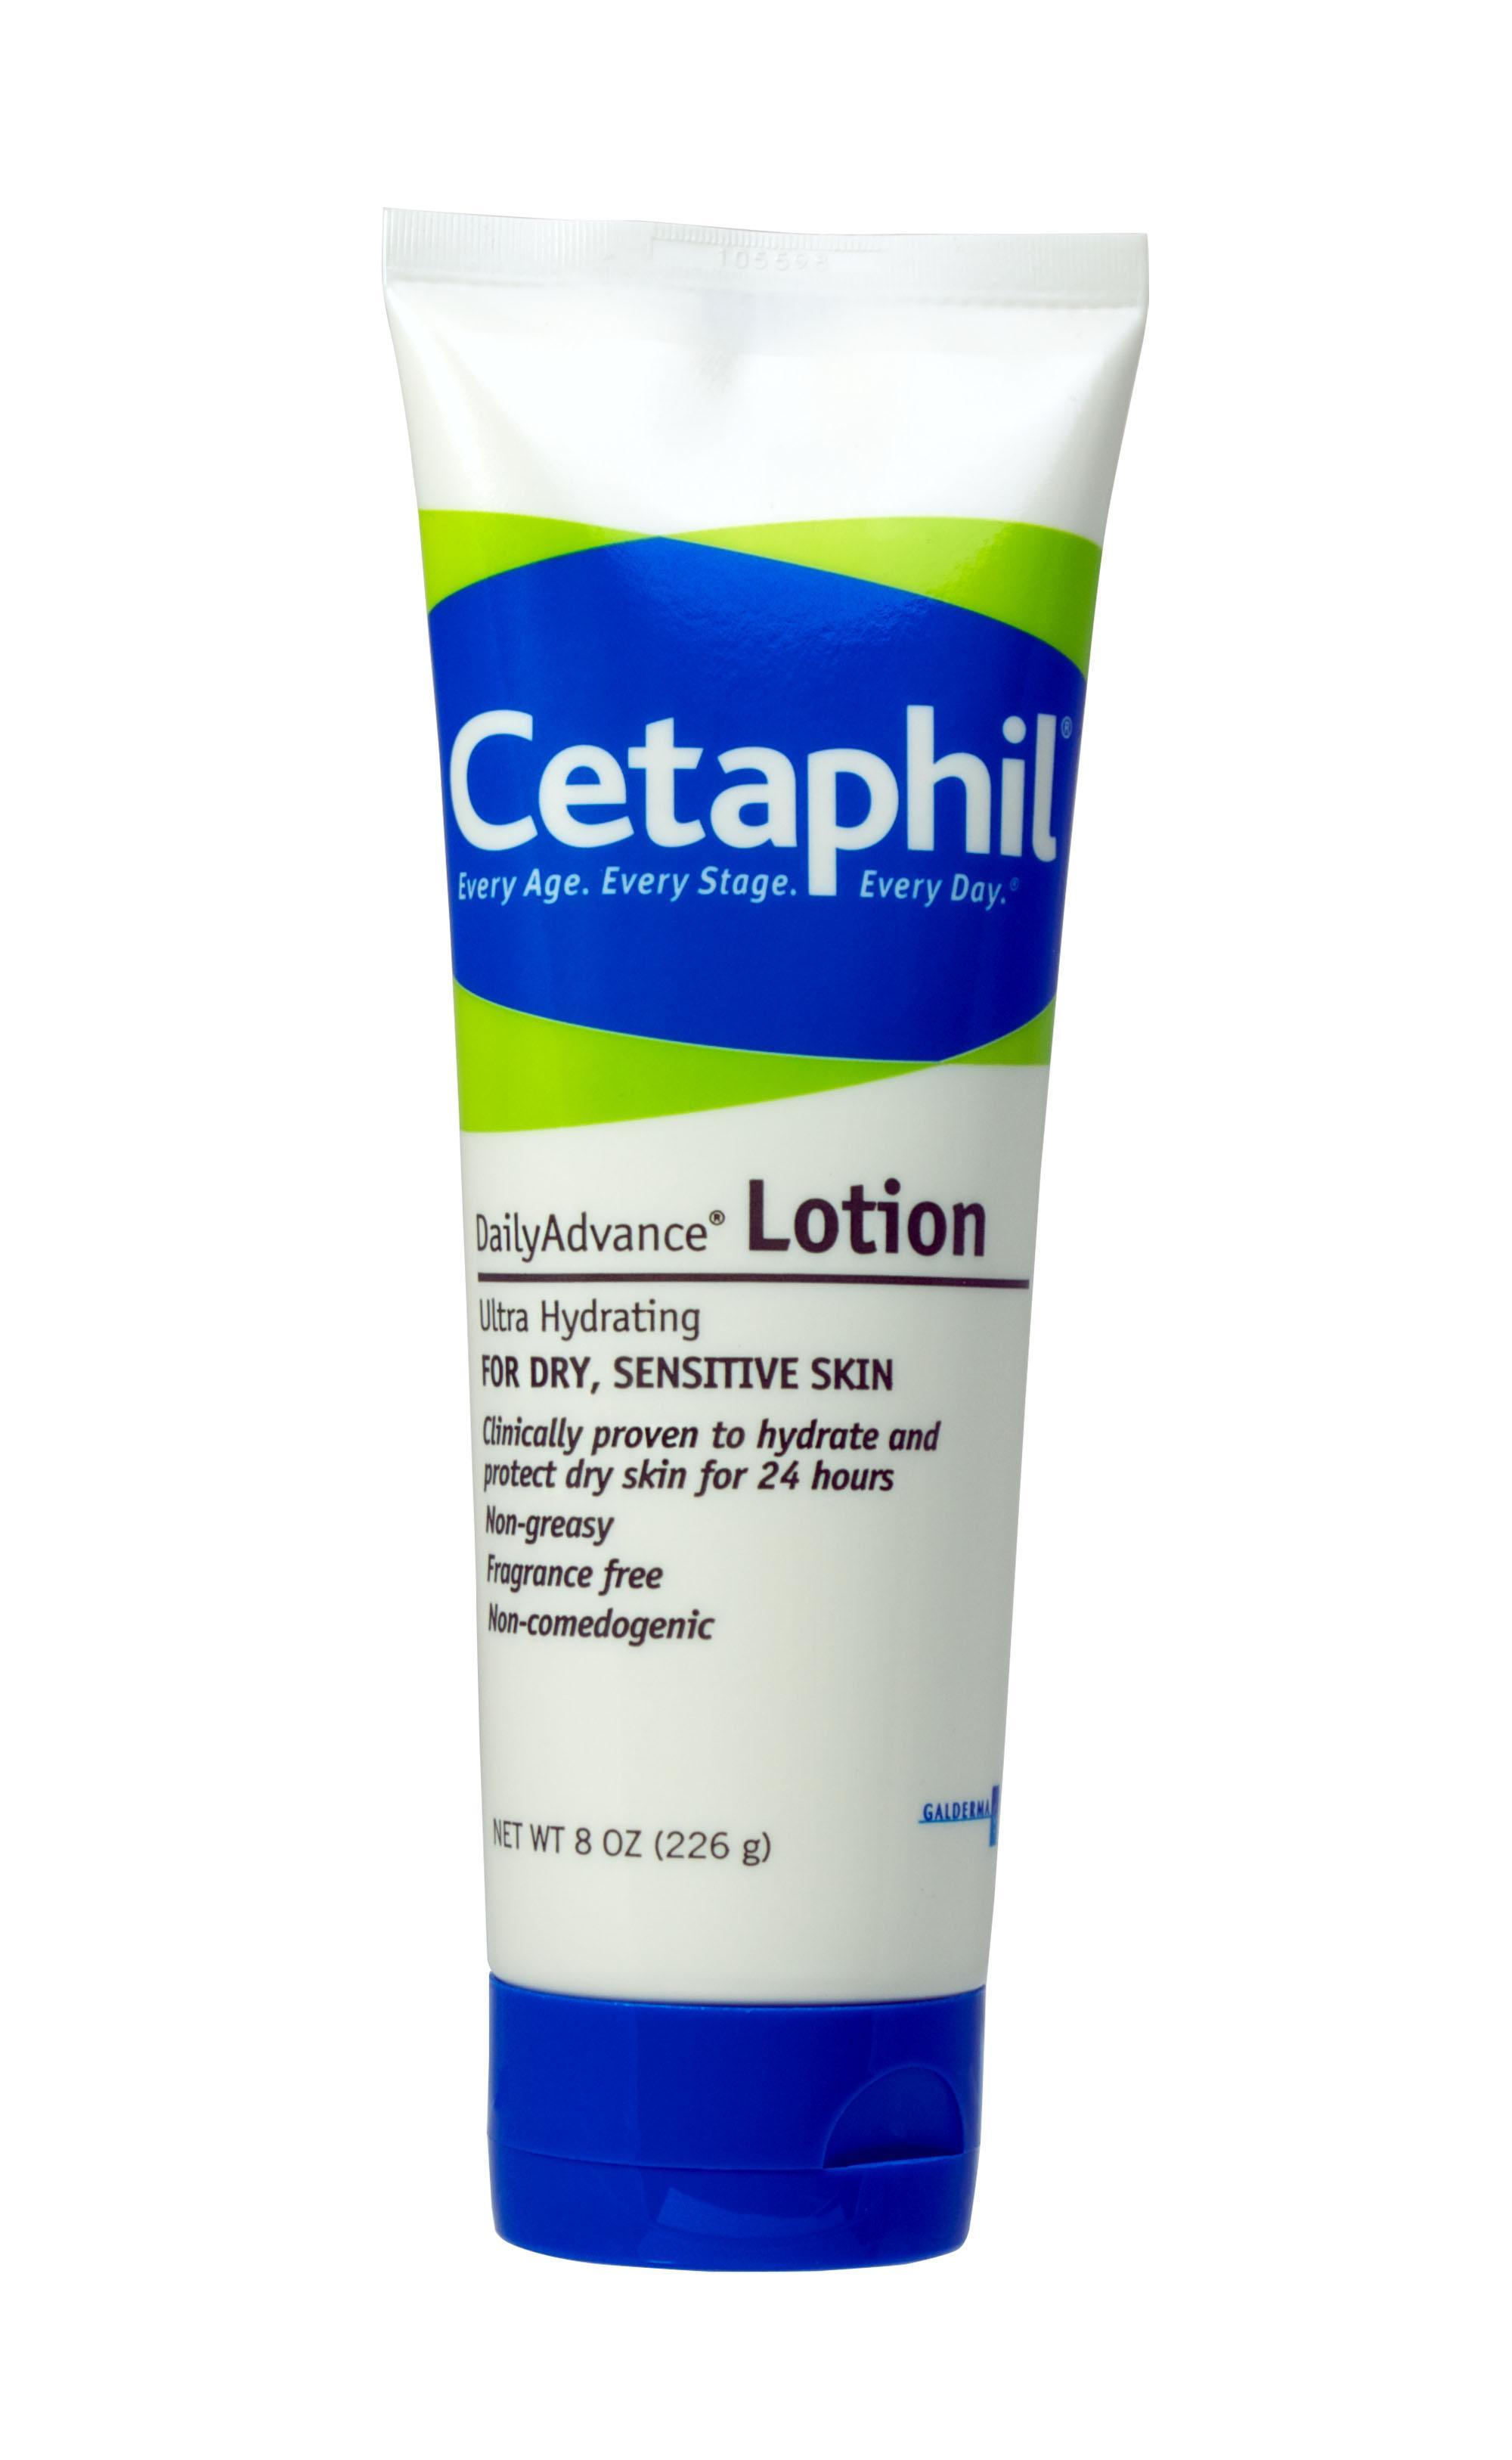 2 Pack - Cetaphil Moisturizing Cream for Dry/Sensitive Skin 3oz Each Rose Hips Mask - For Combination/ Dry/ Sensitive Skin Types 2oz